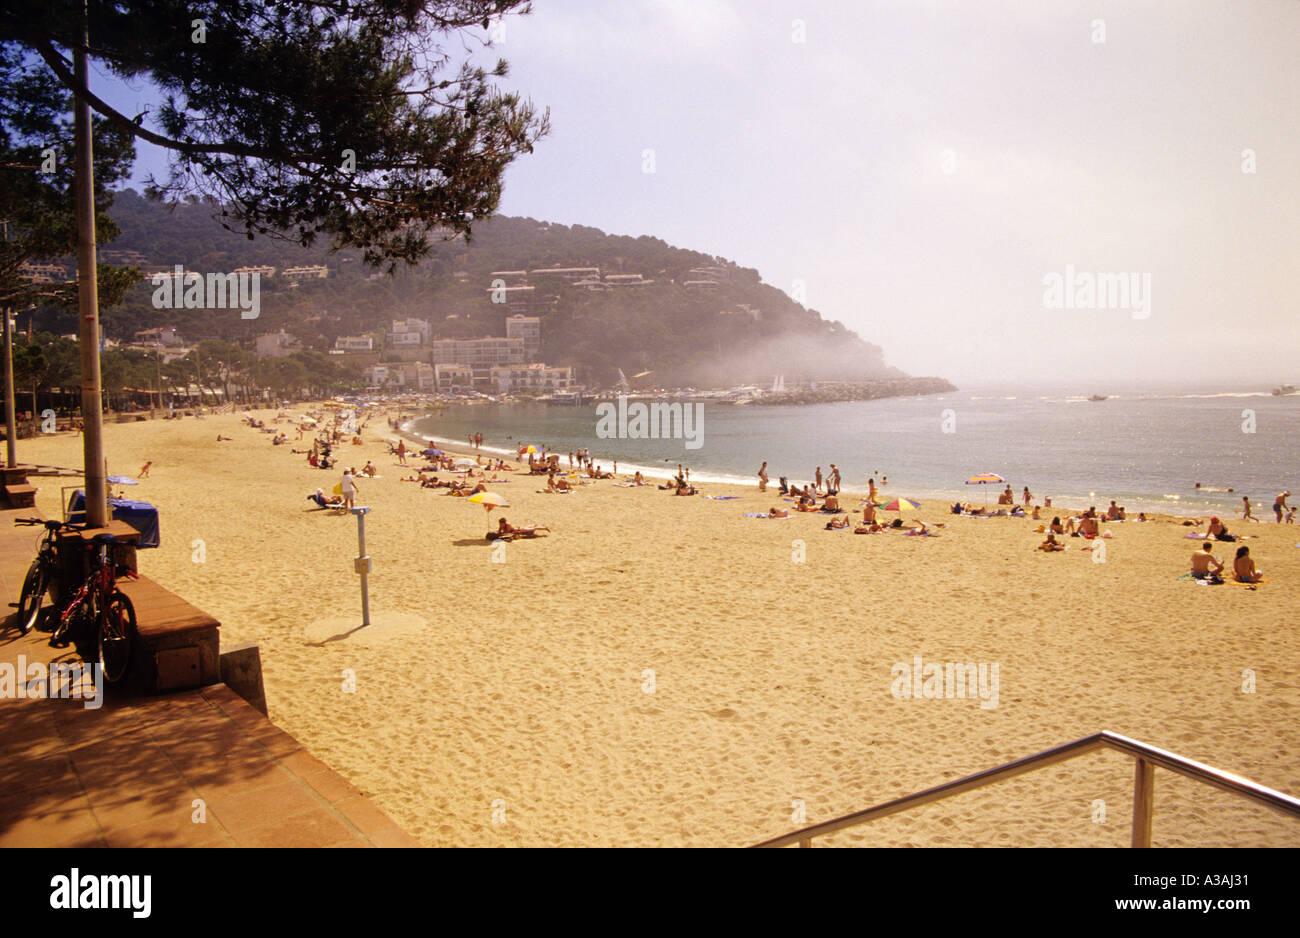 Spanien, Katalonien, Costa Brava, Menschen am Sandstrand Stockbild